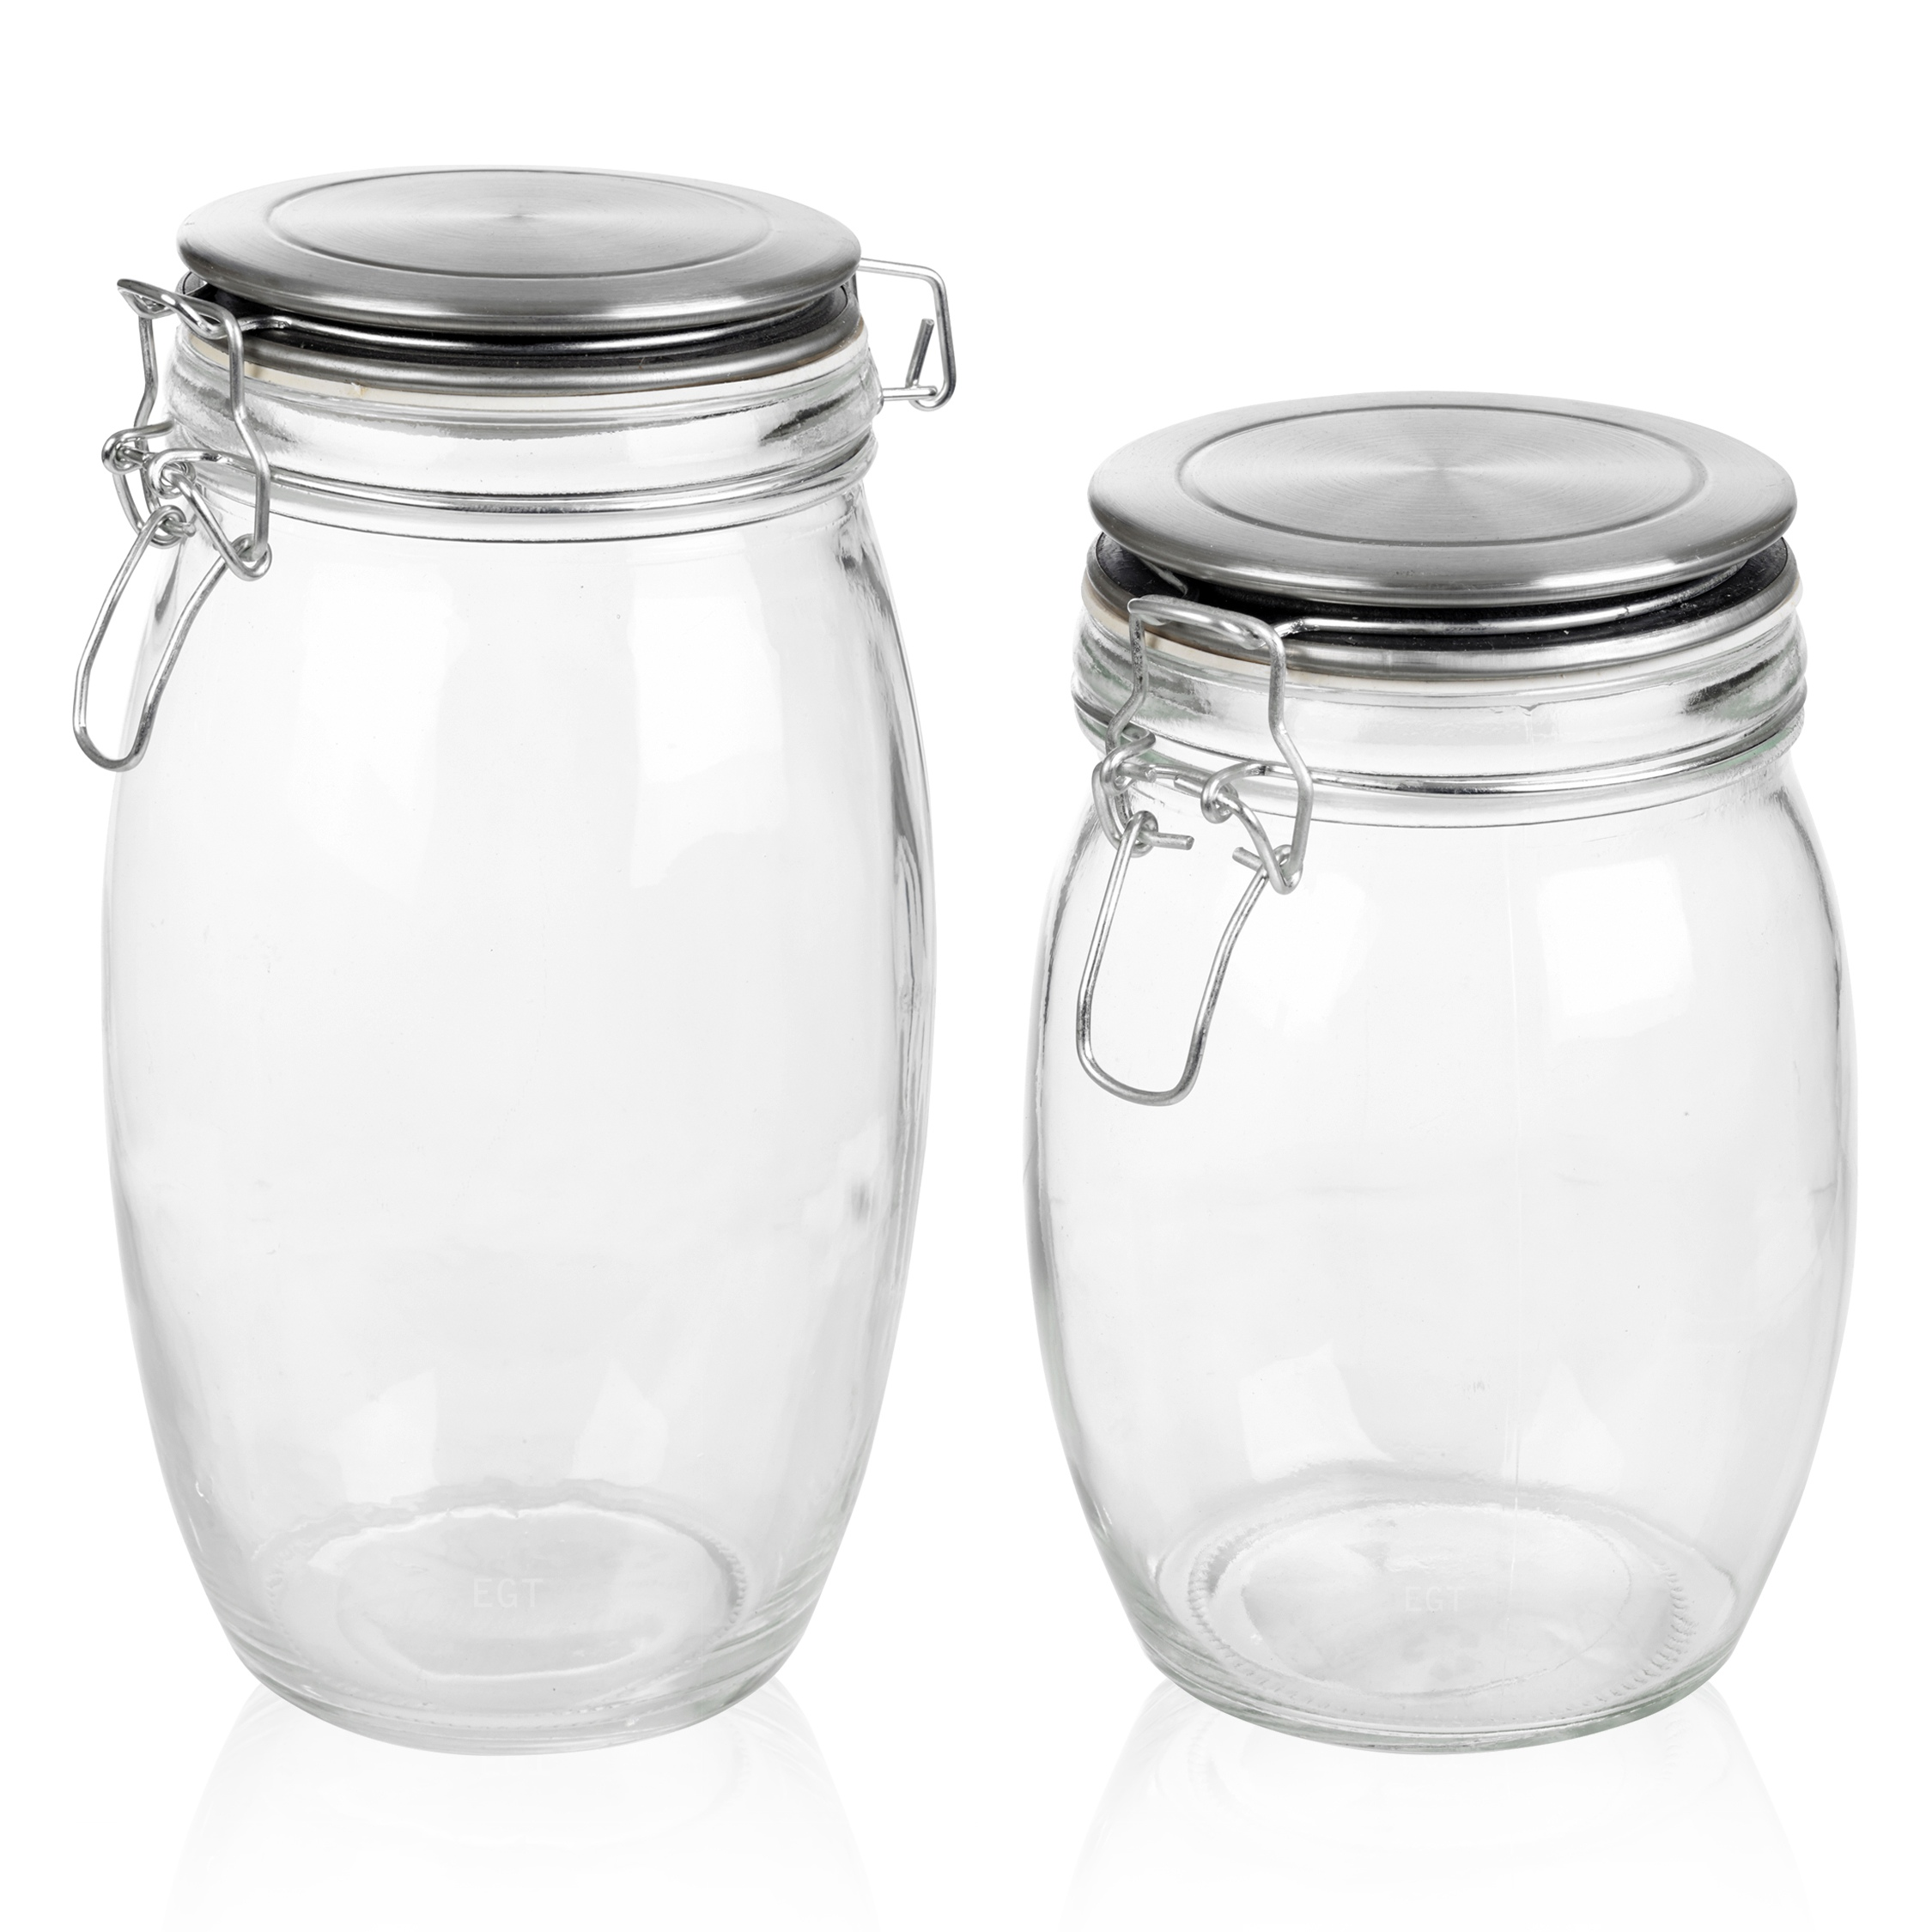 glass clamp lid kitchen storage jar air tight seal metal rice pasta cereal foods. Black Bedroom Furniture Sets. Home Design Ideas